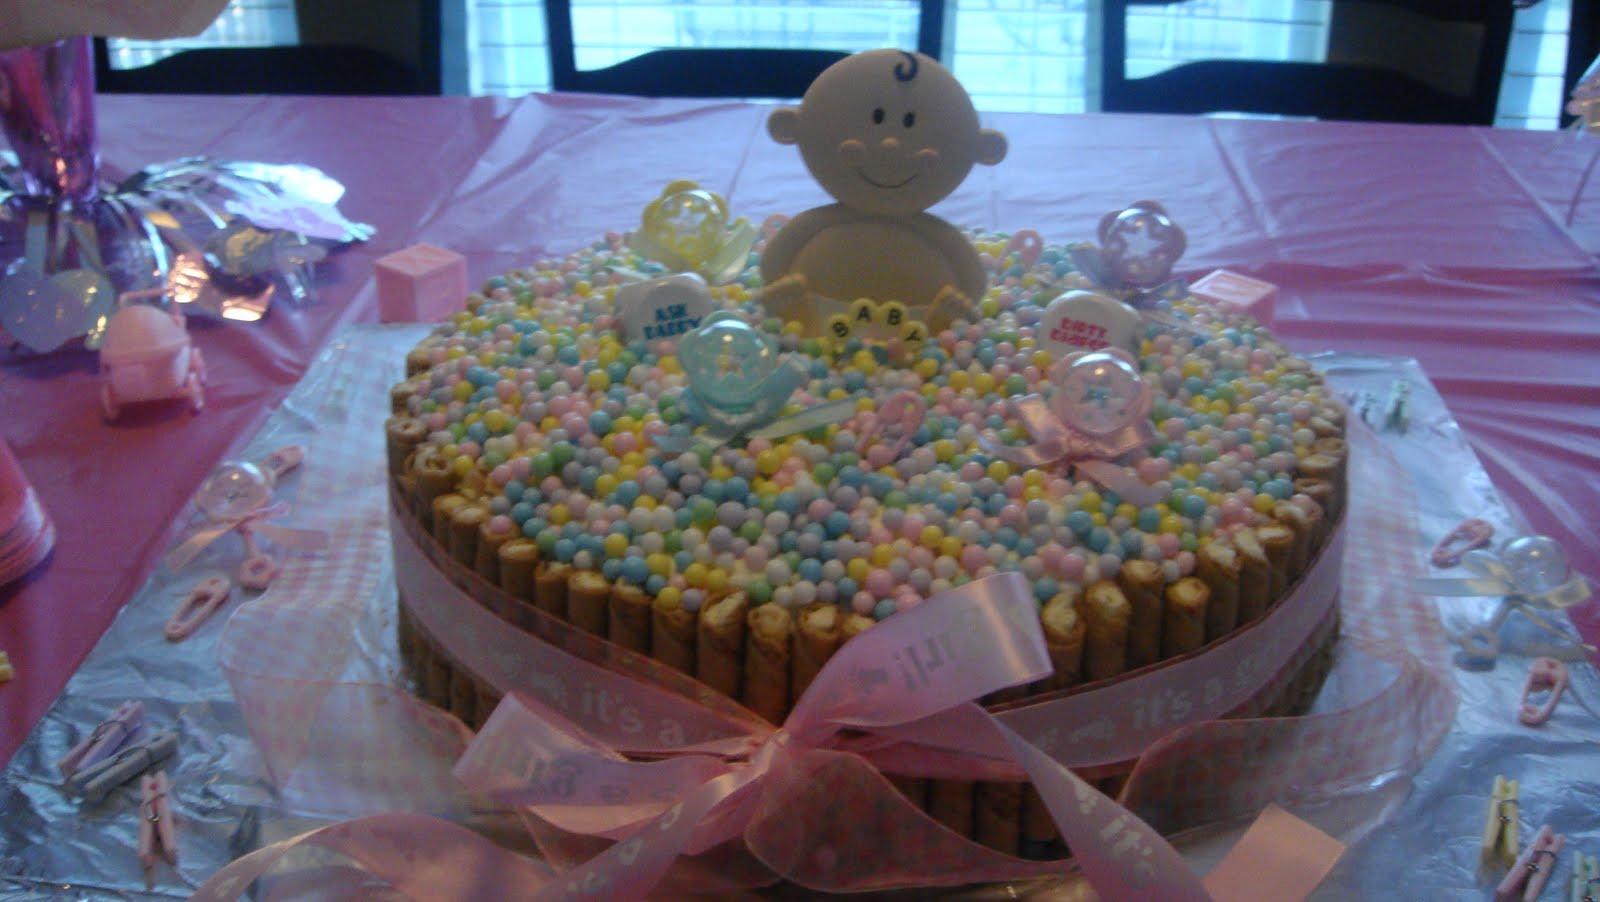 Sandras Cake House